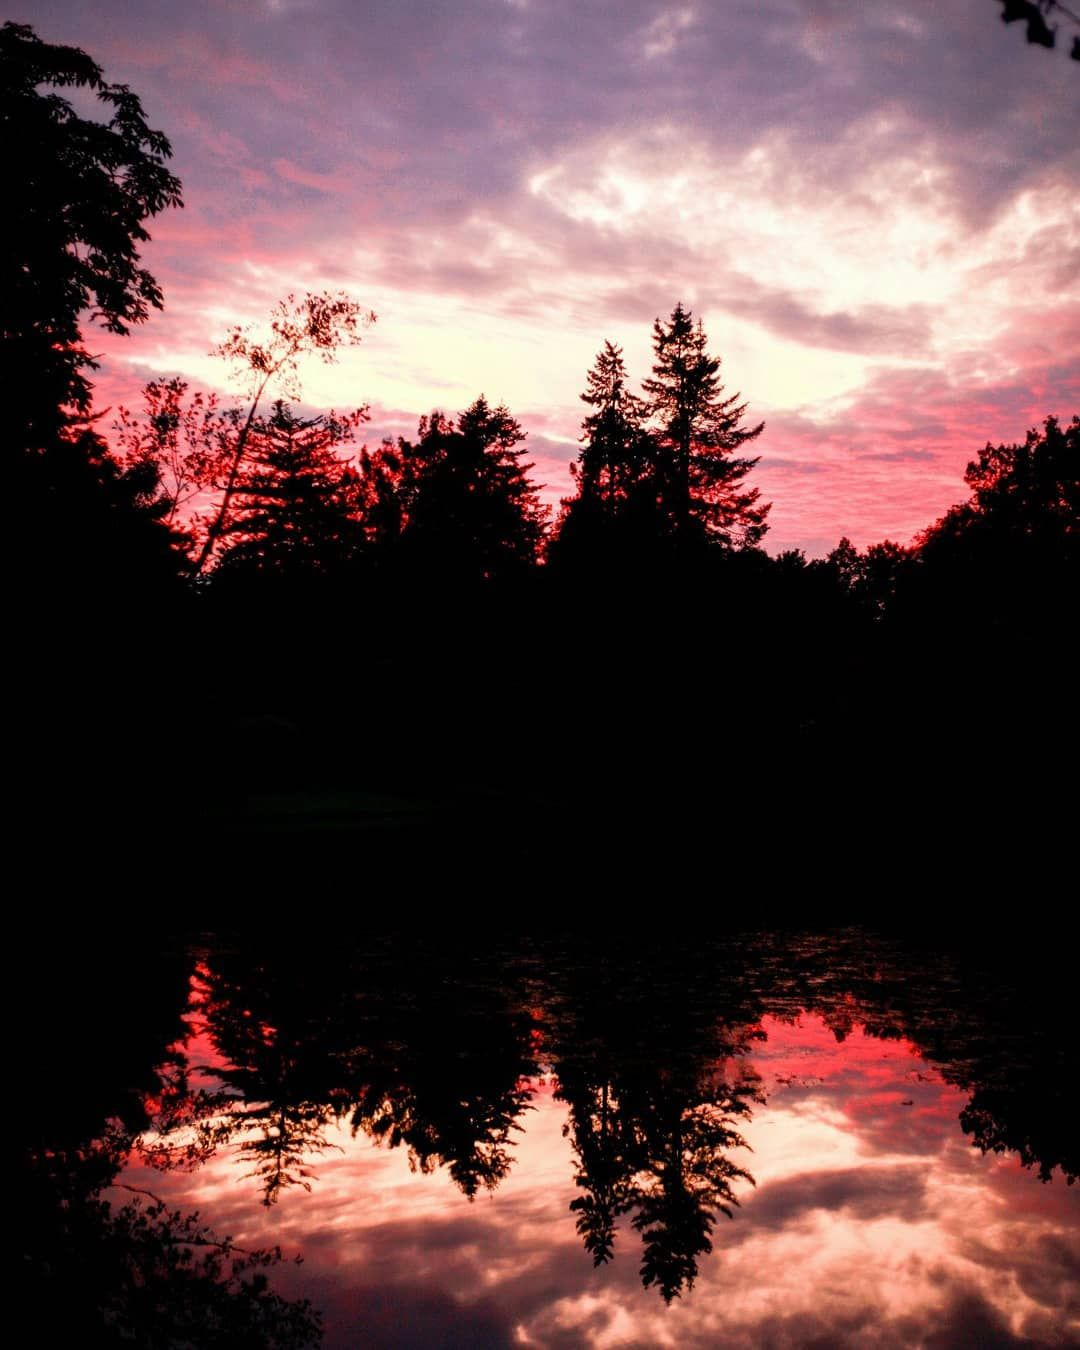 Autumn lights. Kassel, Karlsaue.  Photographer: @salogwyn_fine_Art  #nature #naturelovers #casselfornia #kassel #kasselfornia #wonderful_places #wonderfullife #beautifulnature #beautifullight #motherearth #worldbestshot #seascape #photography #divine_worldplaces #challenge #photooftheday #photoshoot #colorful #gurushotschallenge #gurushots #shotaward #ig_mood #autumn #autumnvibes🍁 #amazing_shots #trees #sundown #glowing #redcolour #color